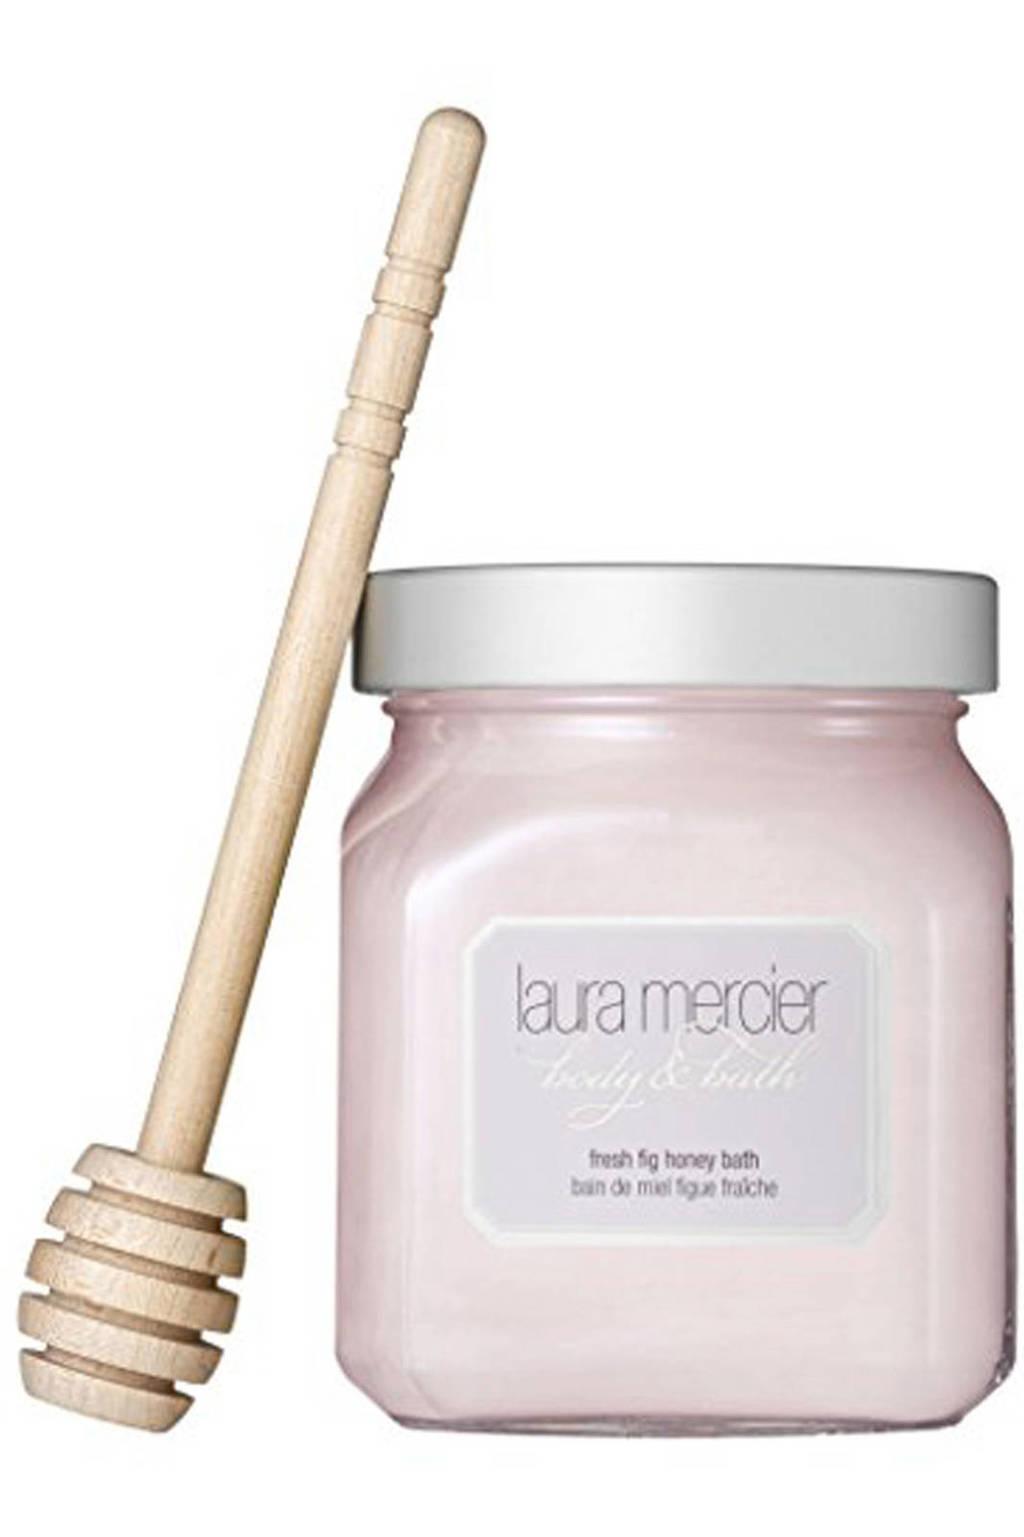 Laura Mercier Body & Bath Honey douchecrème - 300 gr